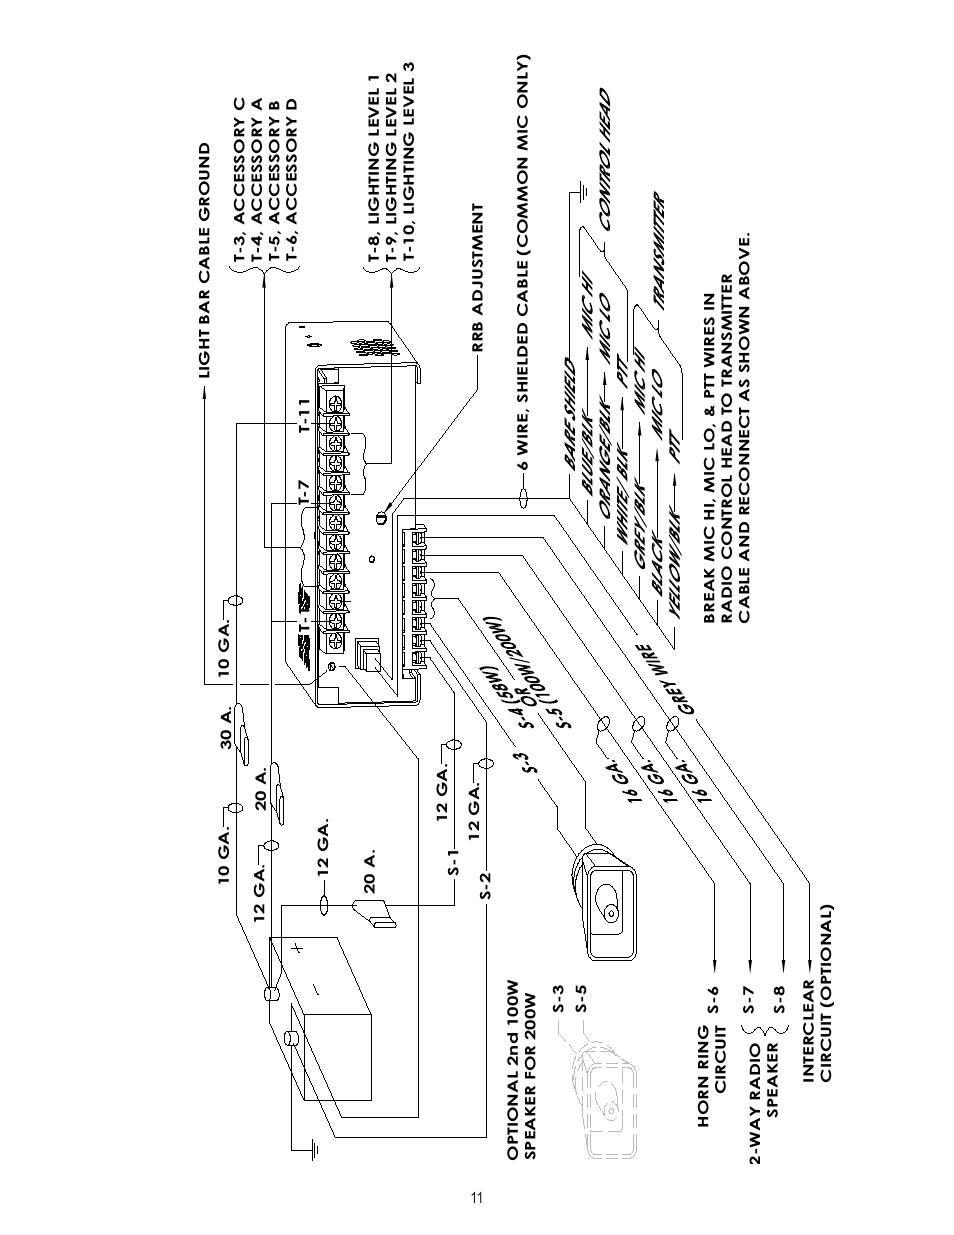 code 3 vcon siren wiring diagram polaris parts wiring  code 3 siren wiring diagram #13